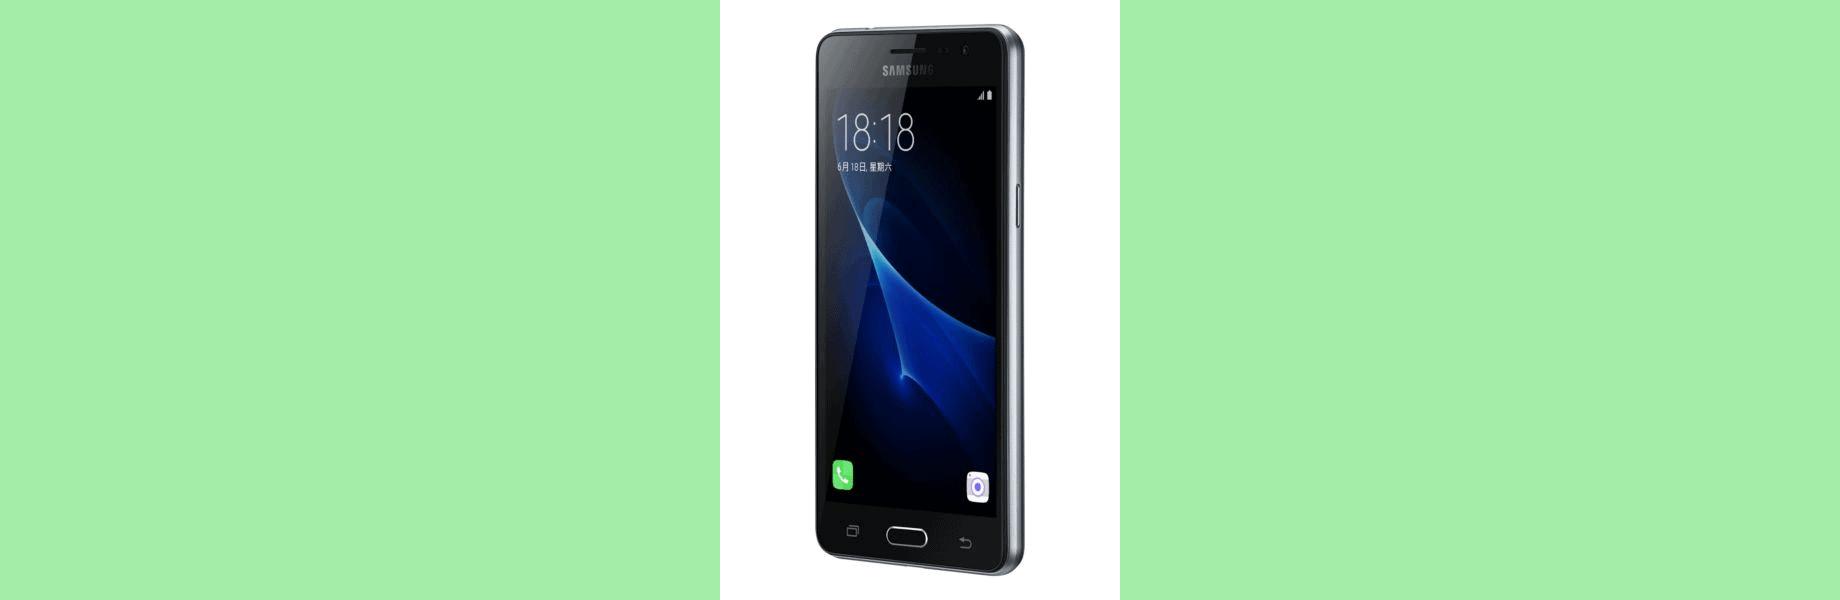 Samsung Galaxy J3 Pro 6